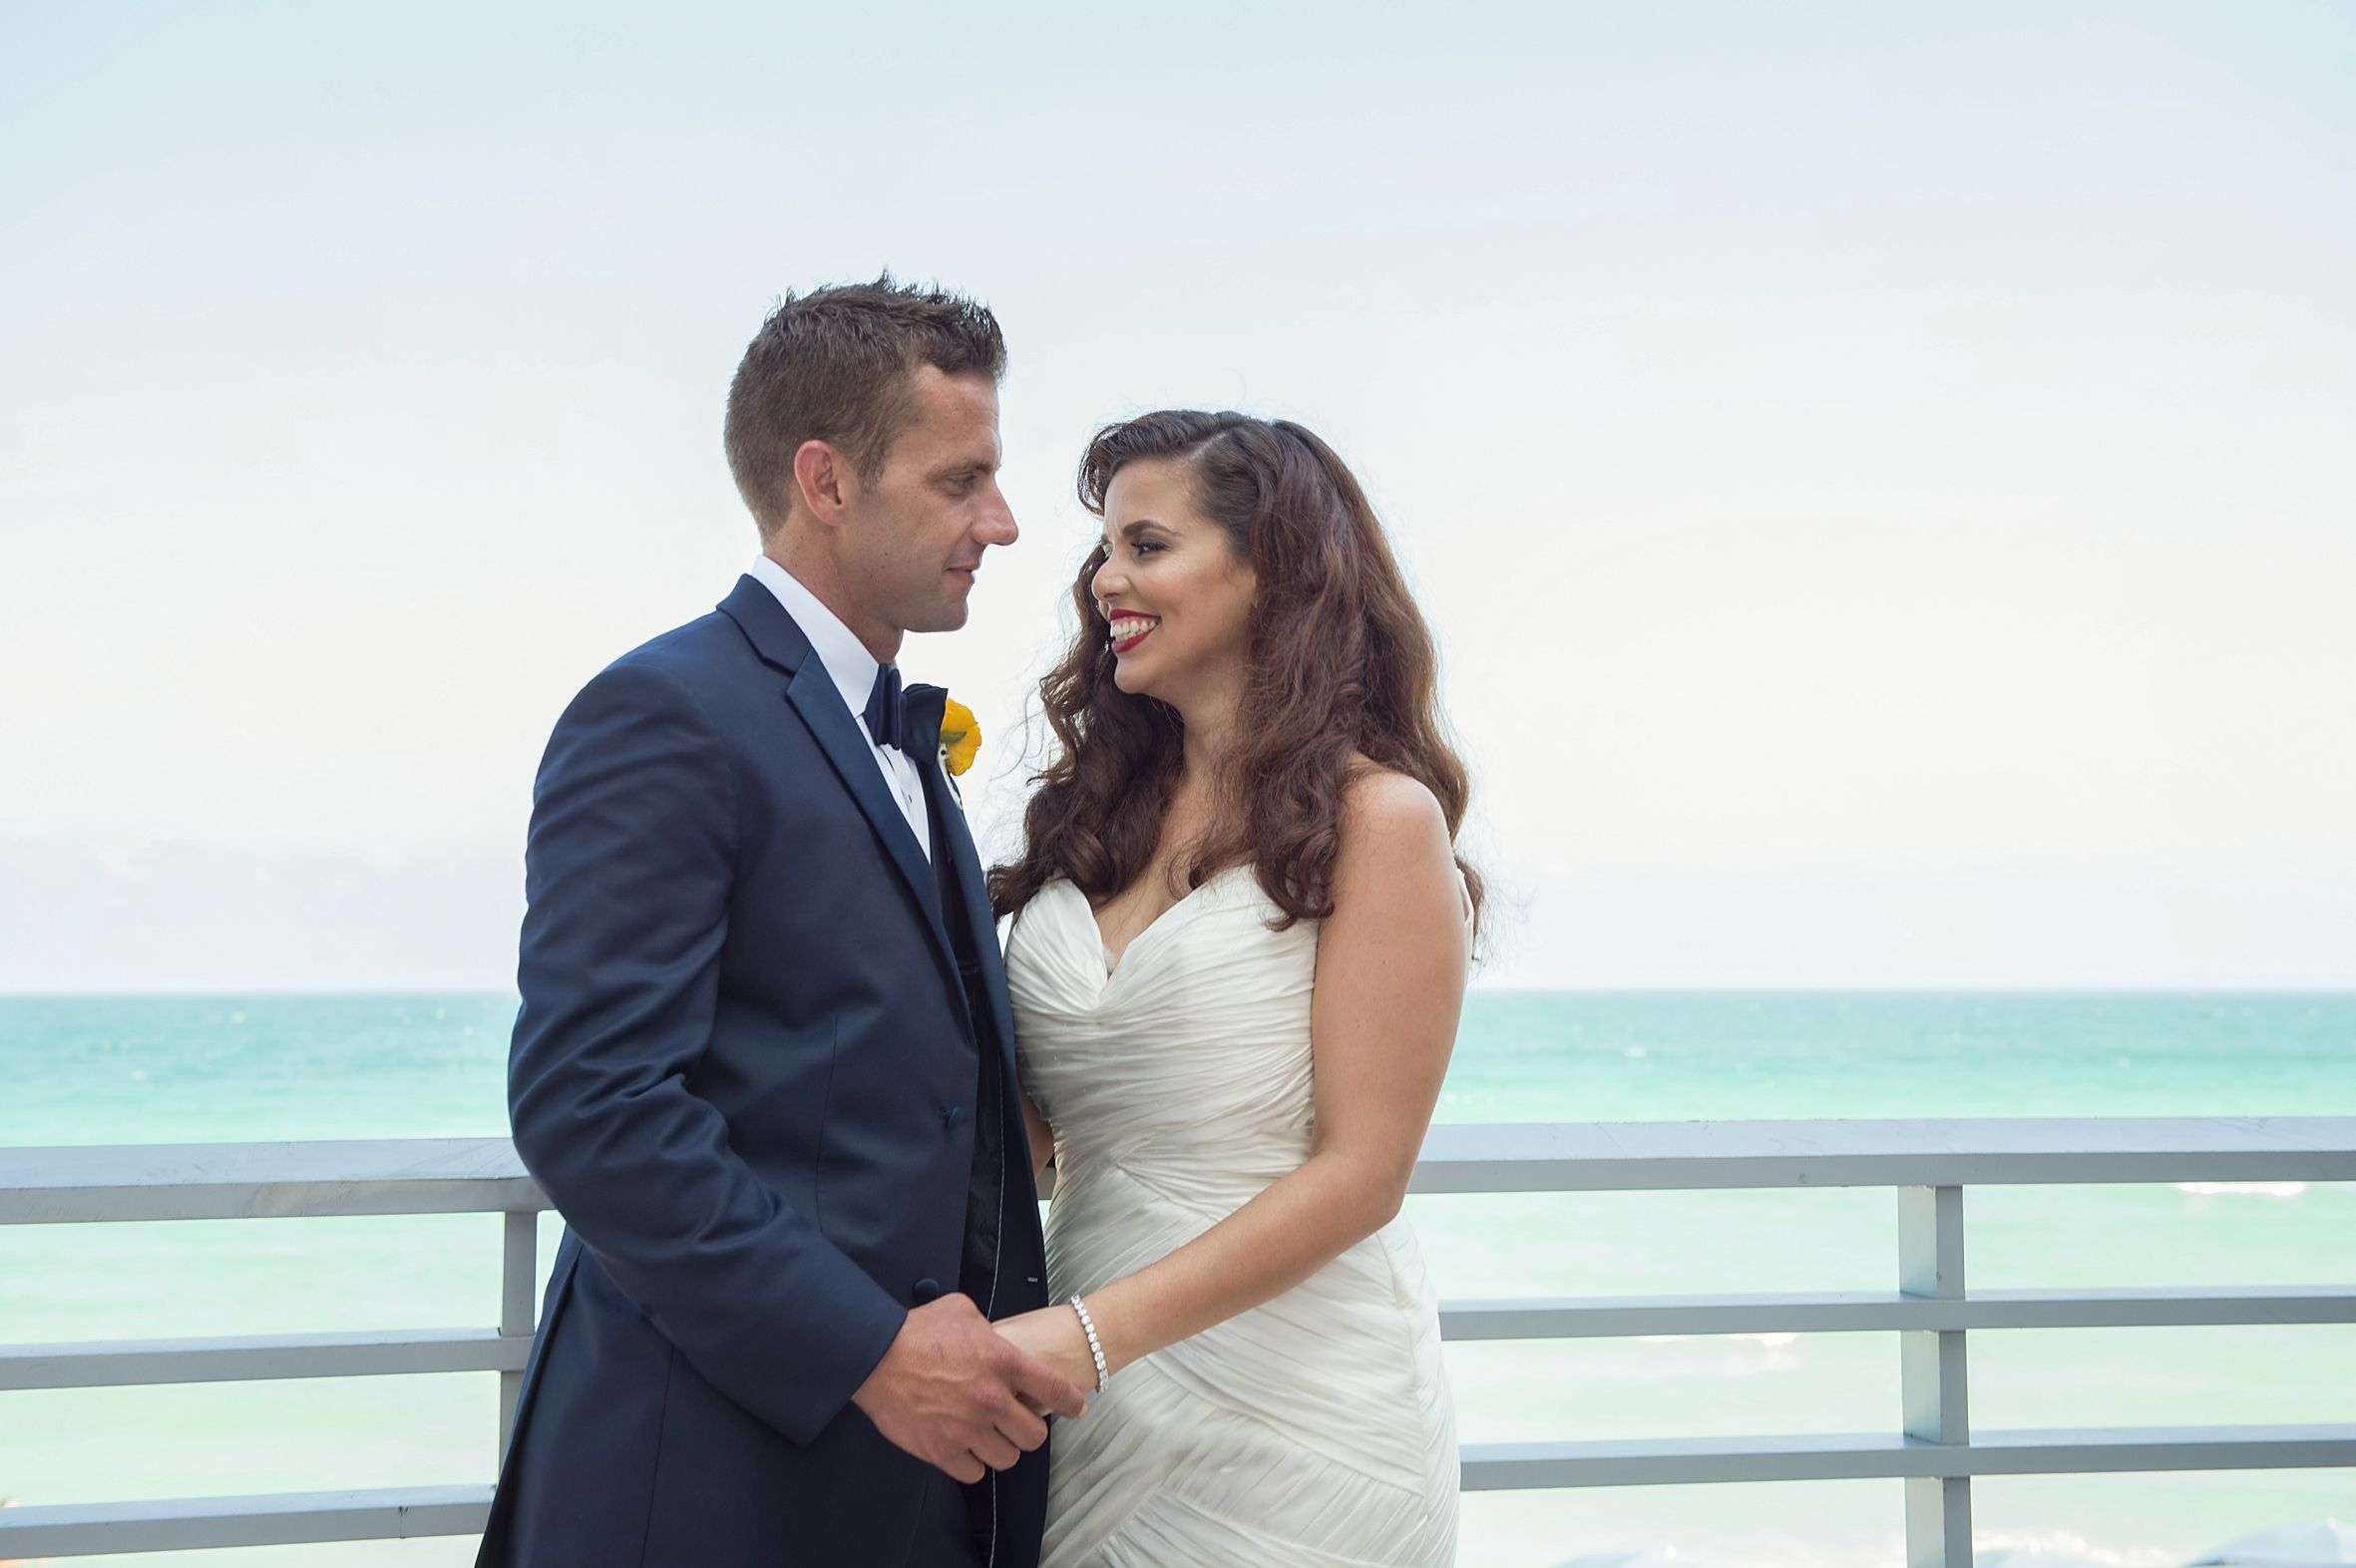 DR3, streaming, licenspenge, gift ved første blik